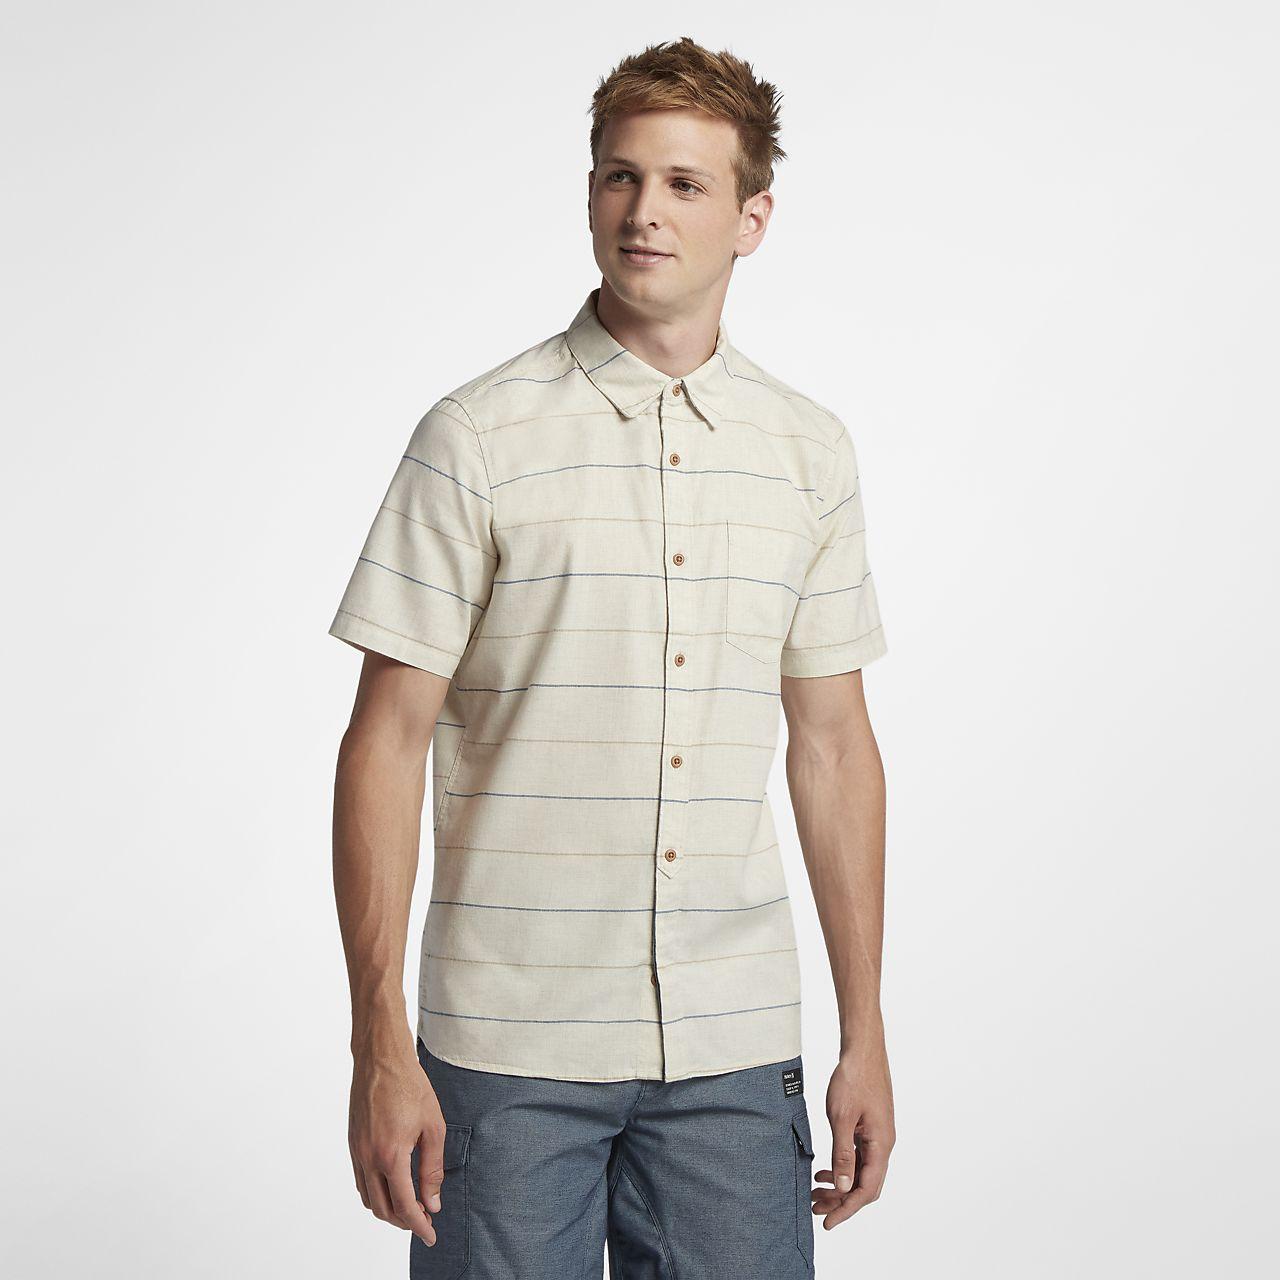 Hurley Clifton Men's Short Sleeve Shirt